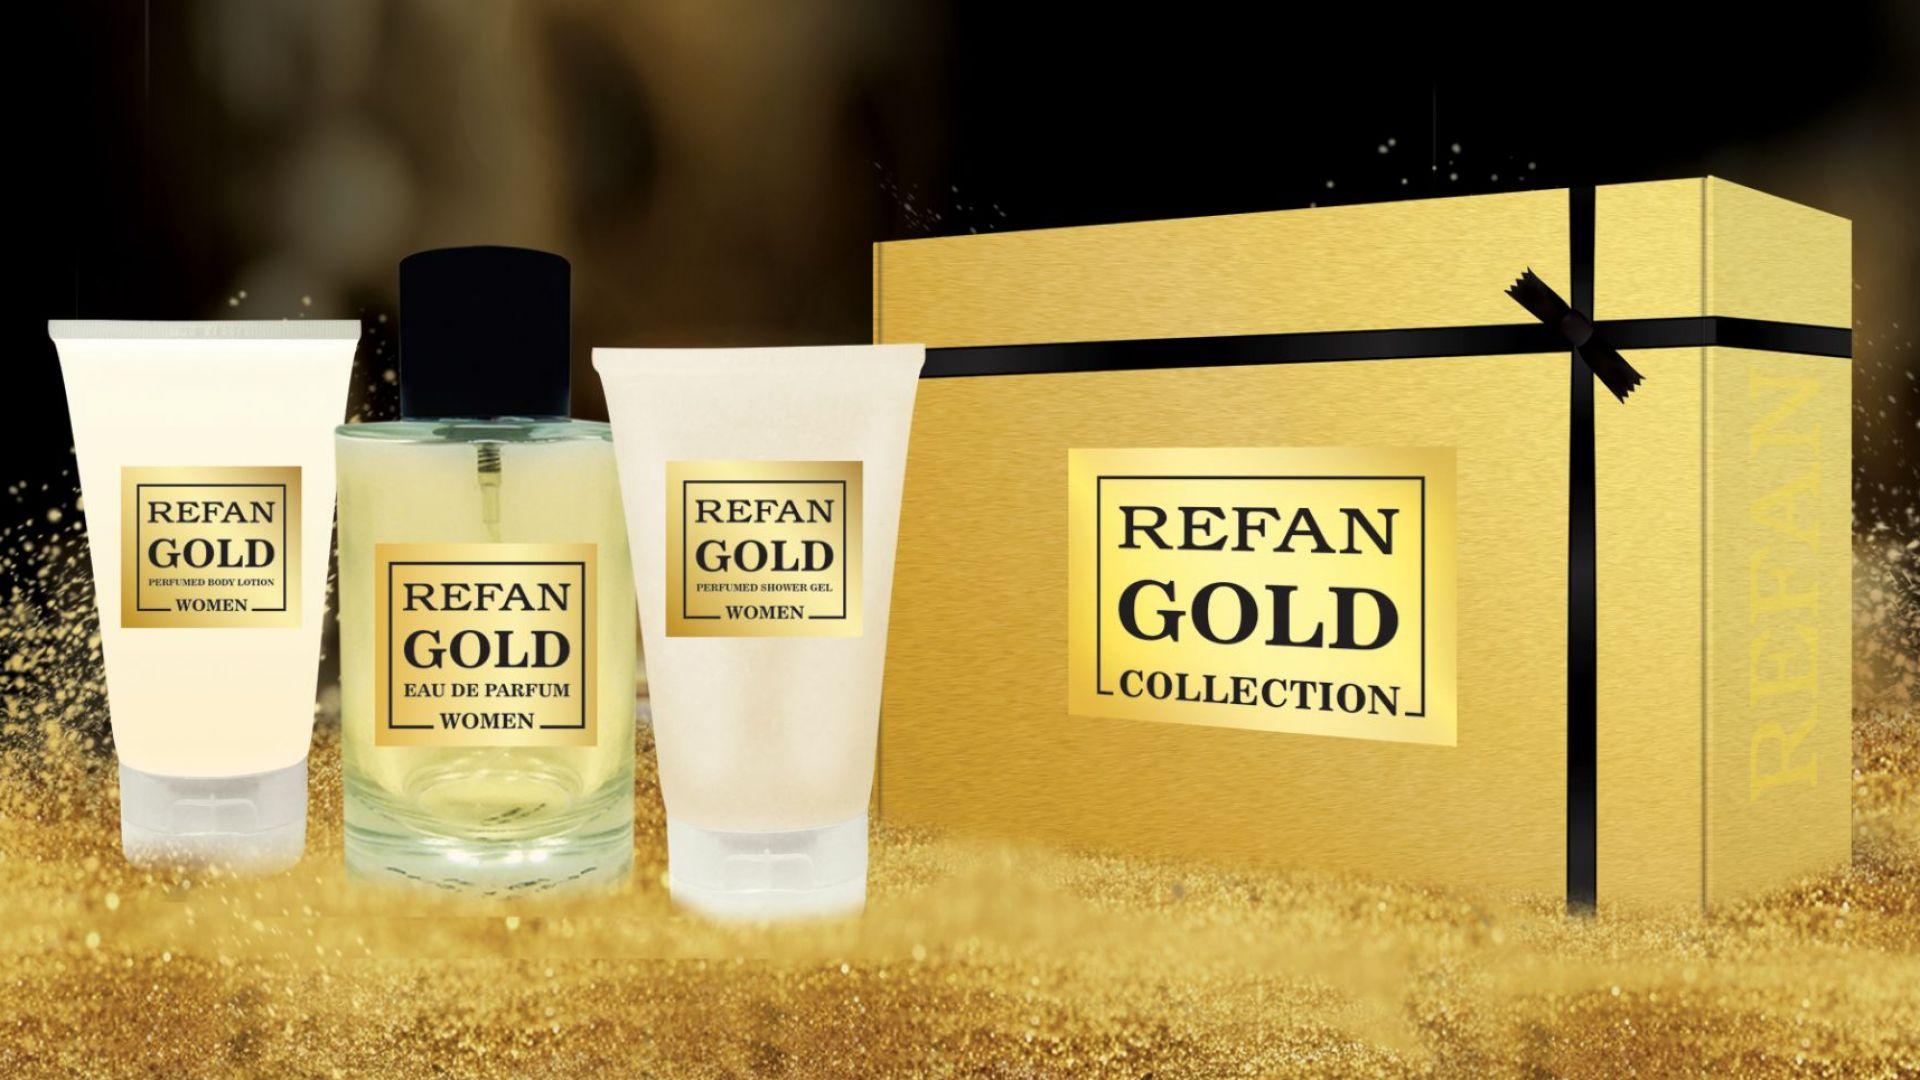 Kомплект Refan Gold Collection осигурява нежна и ароматна грижа за кожата